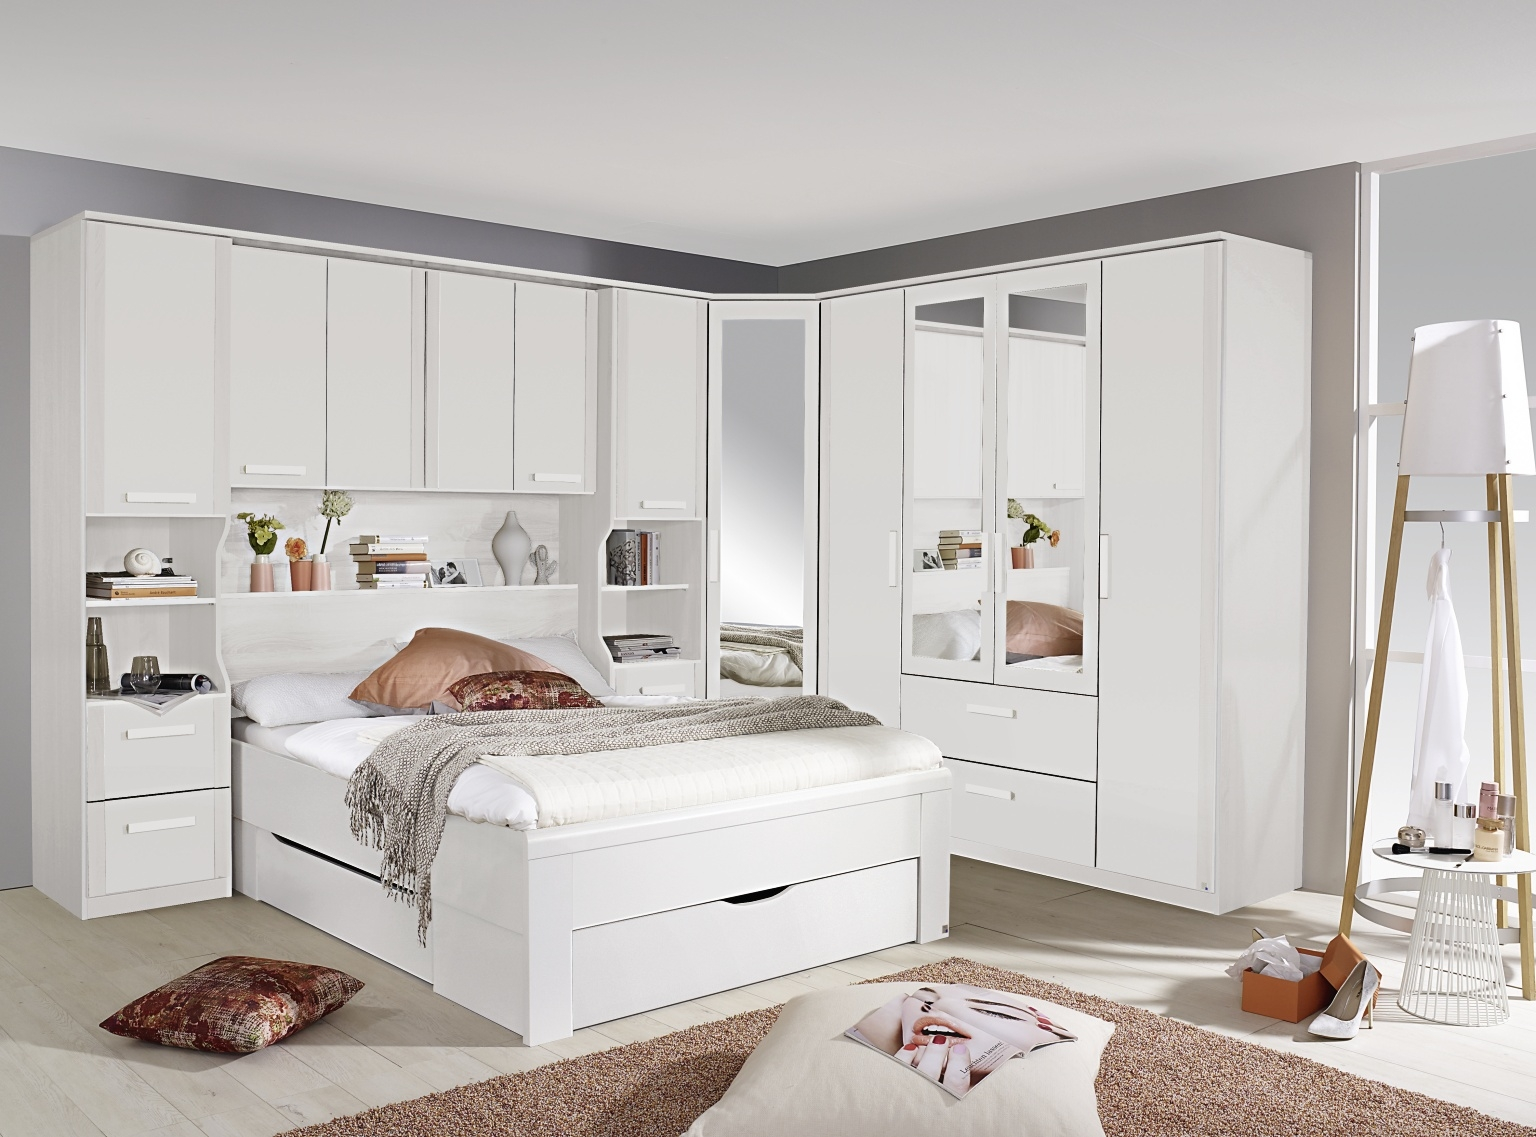 Rauch Rivera Alpine White 4 Door Wardrobe with Cornice - W 181cm